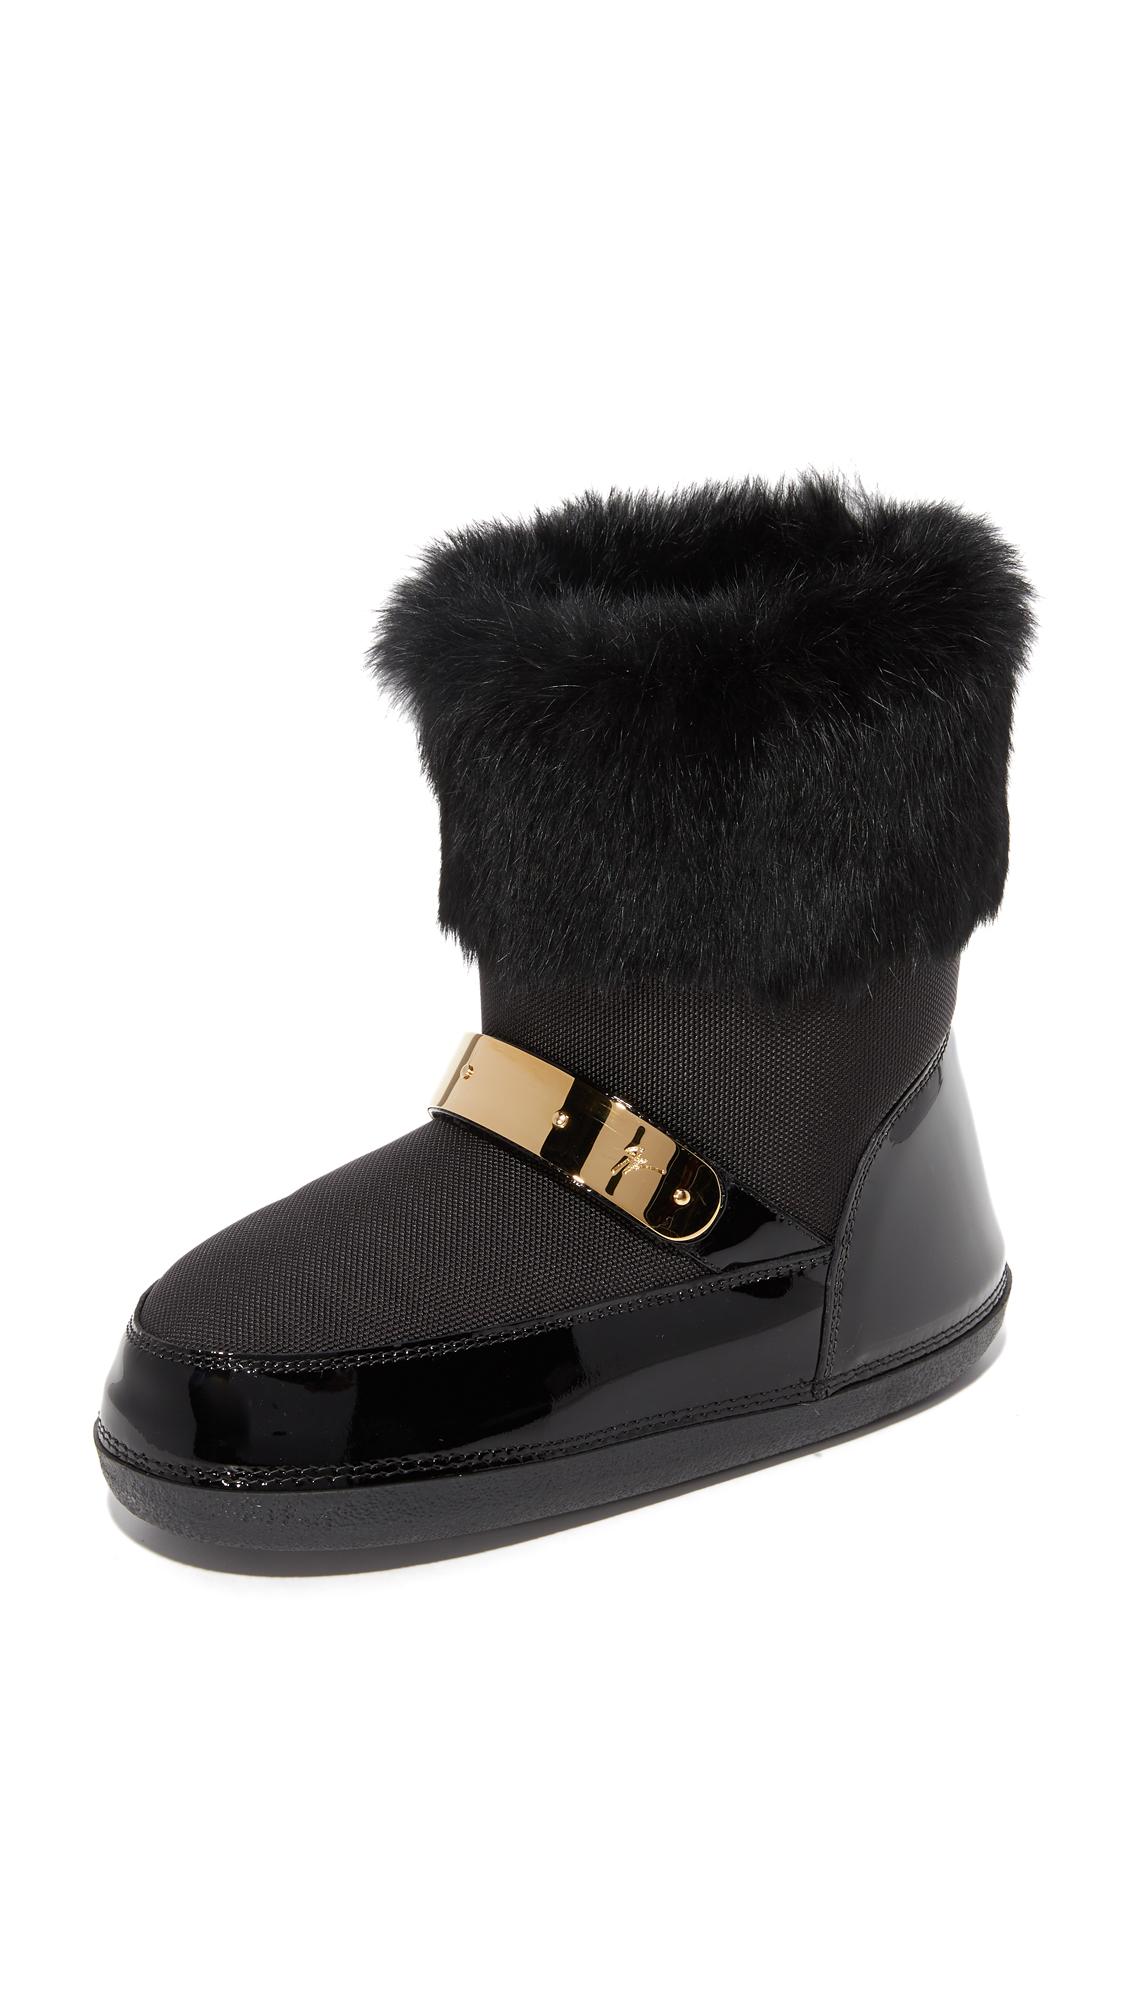 Giuseppe Zanotti Moon Boots - Black at Shopbop